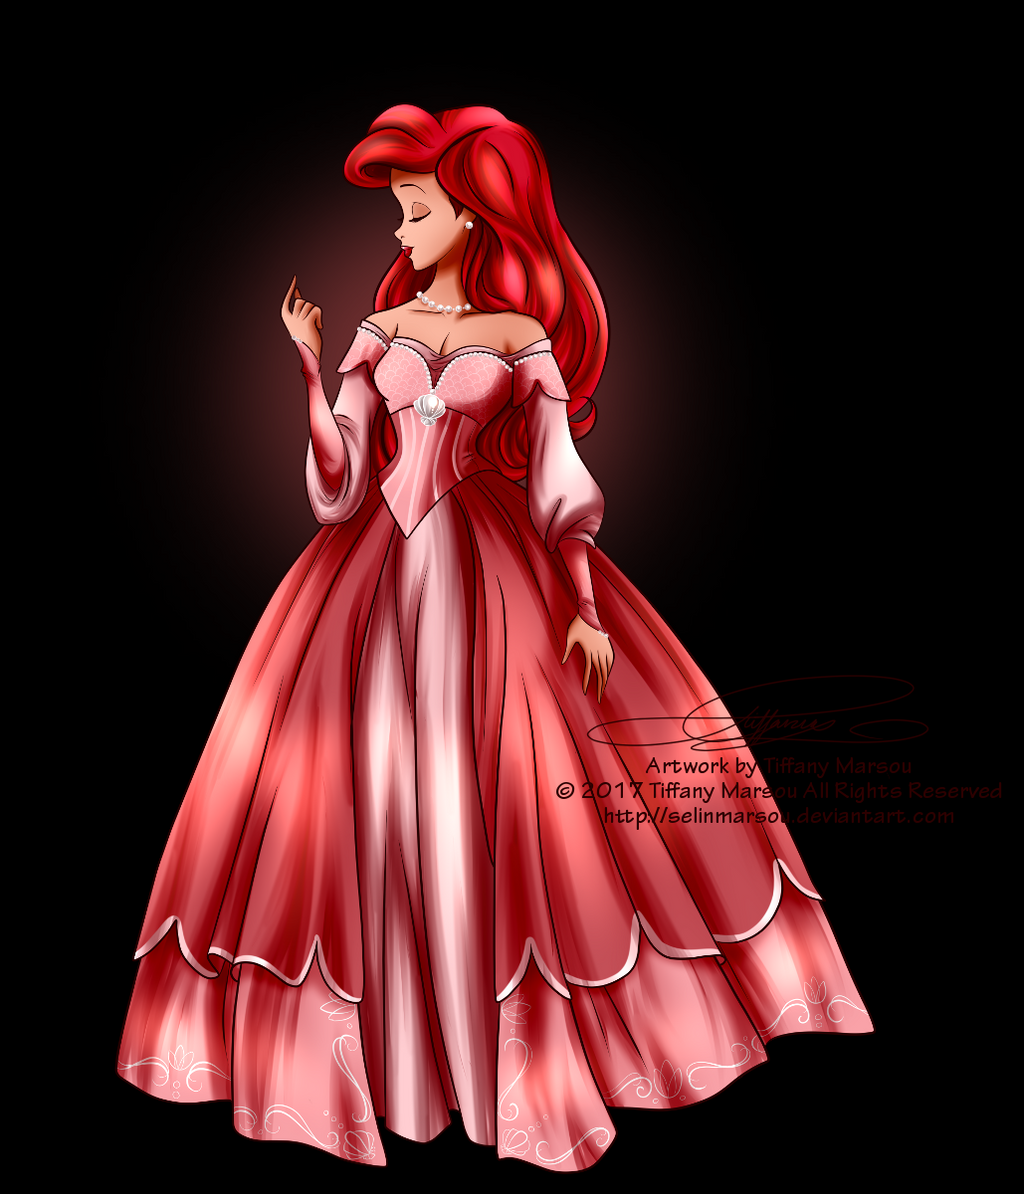 Disney Haut Couture - Ariel by selinmarsou